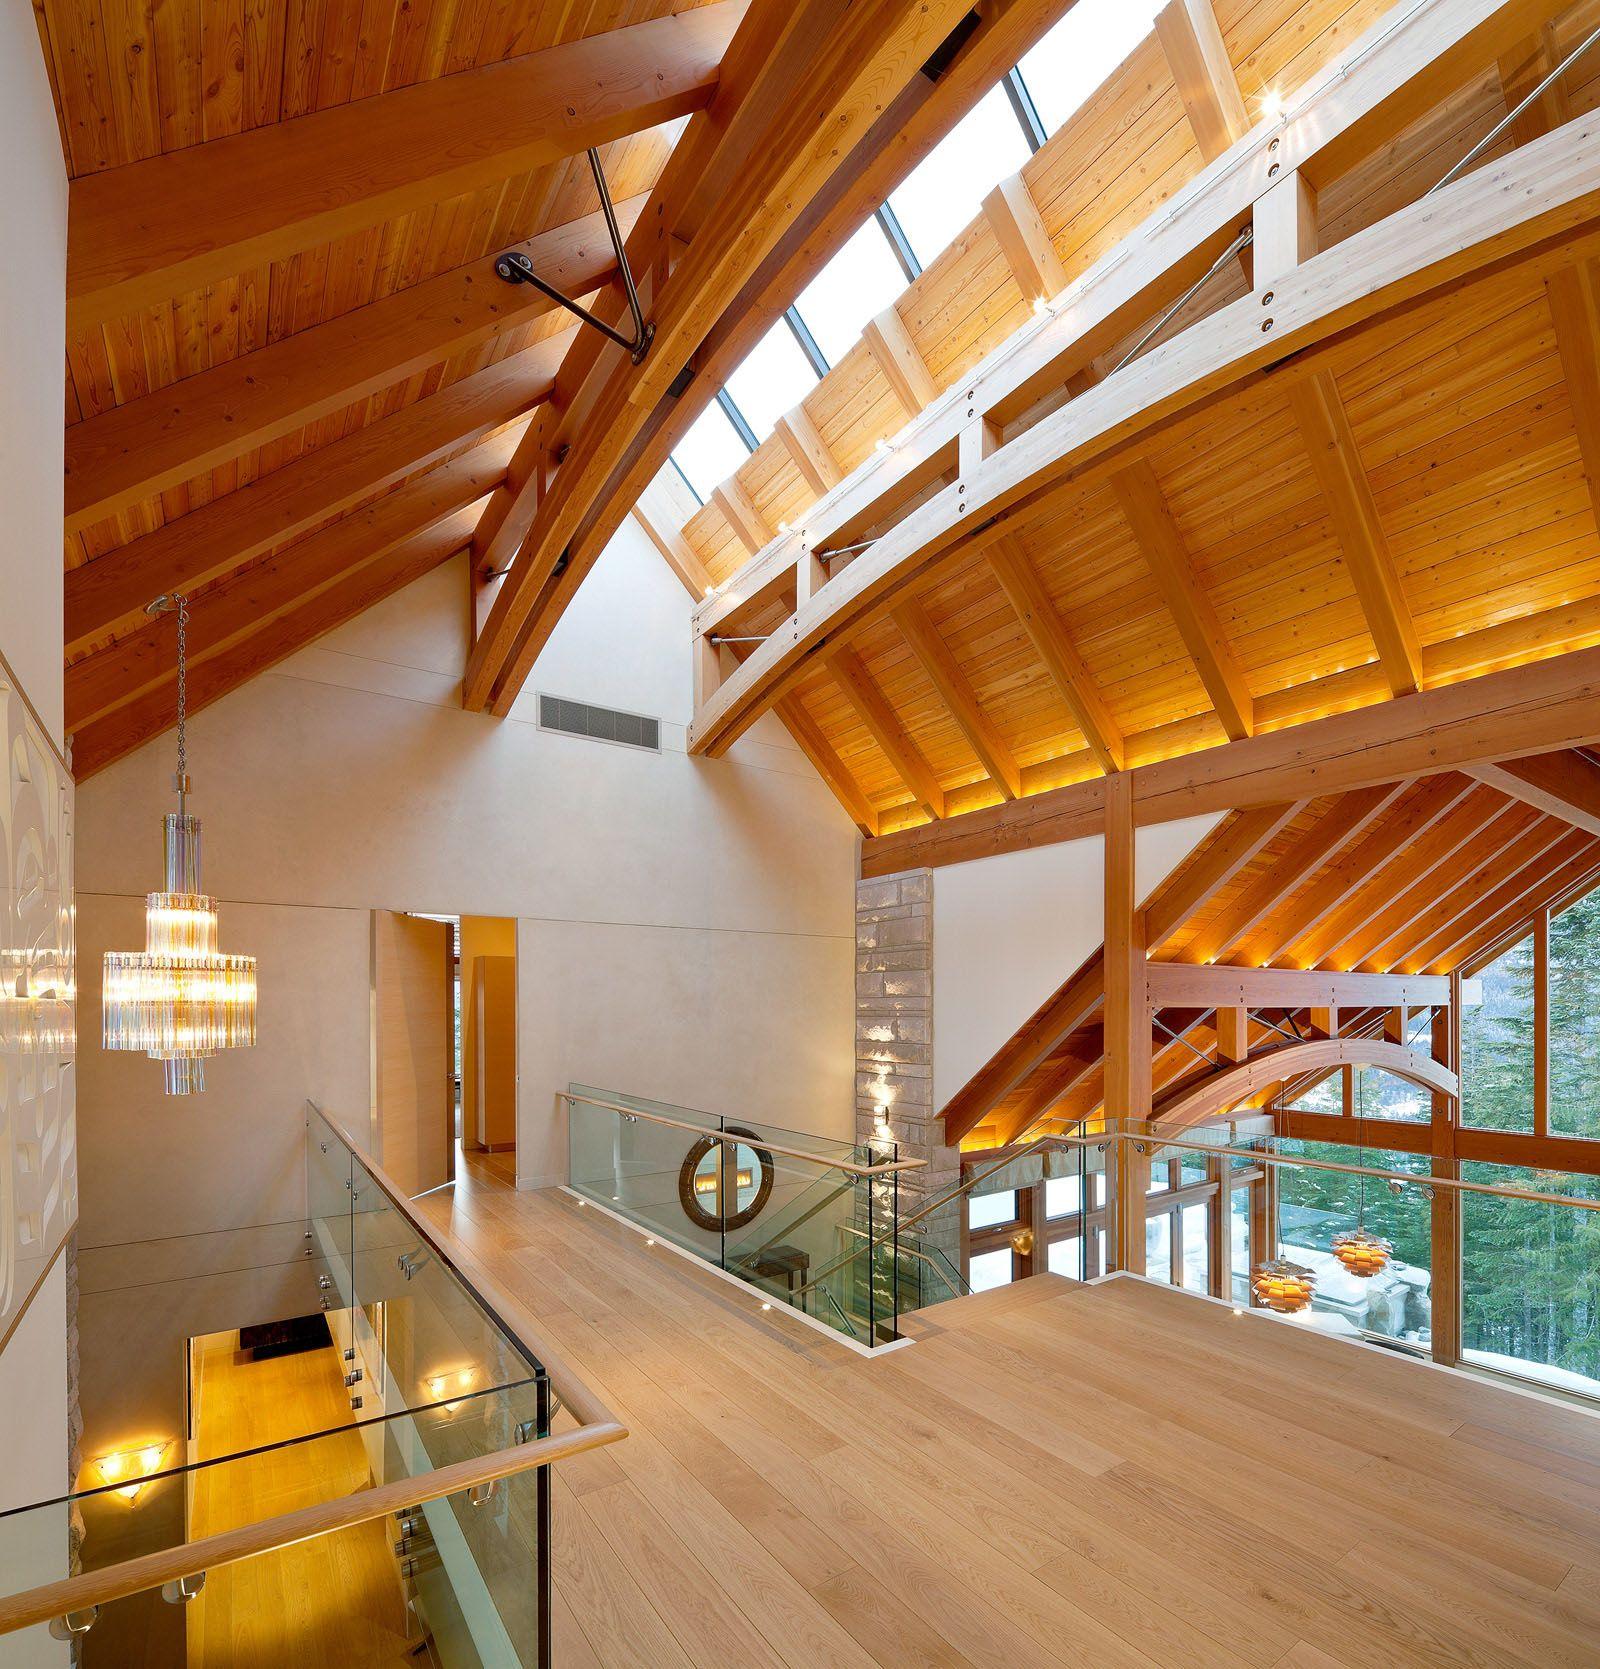 Luxury Timber Frame Mountain Retreat In Whistler Timber